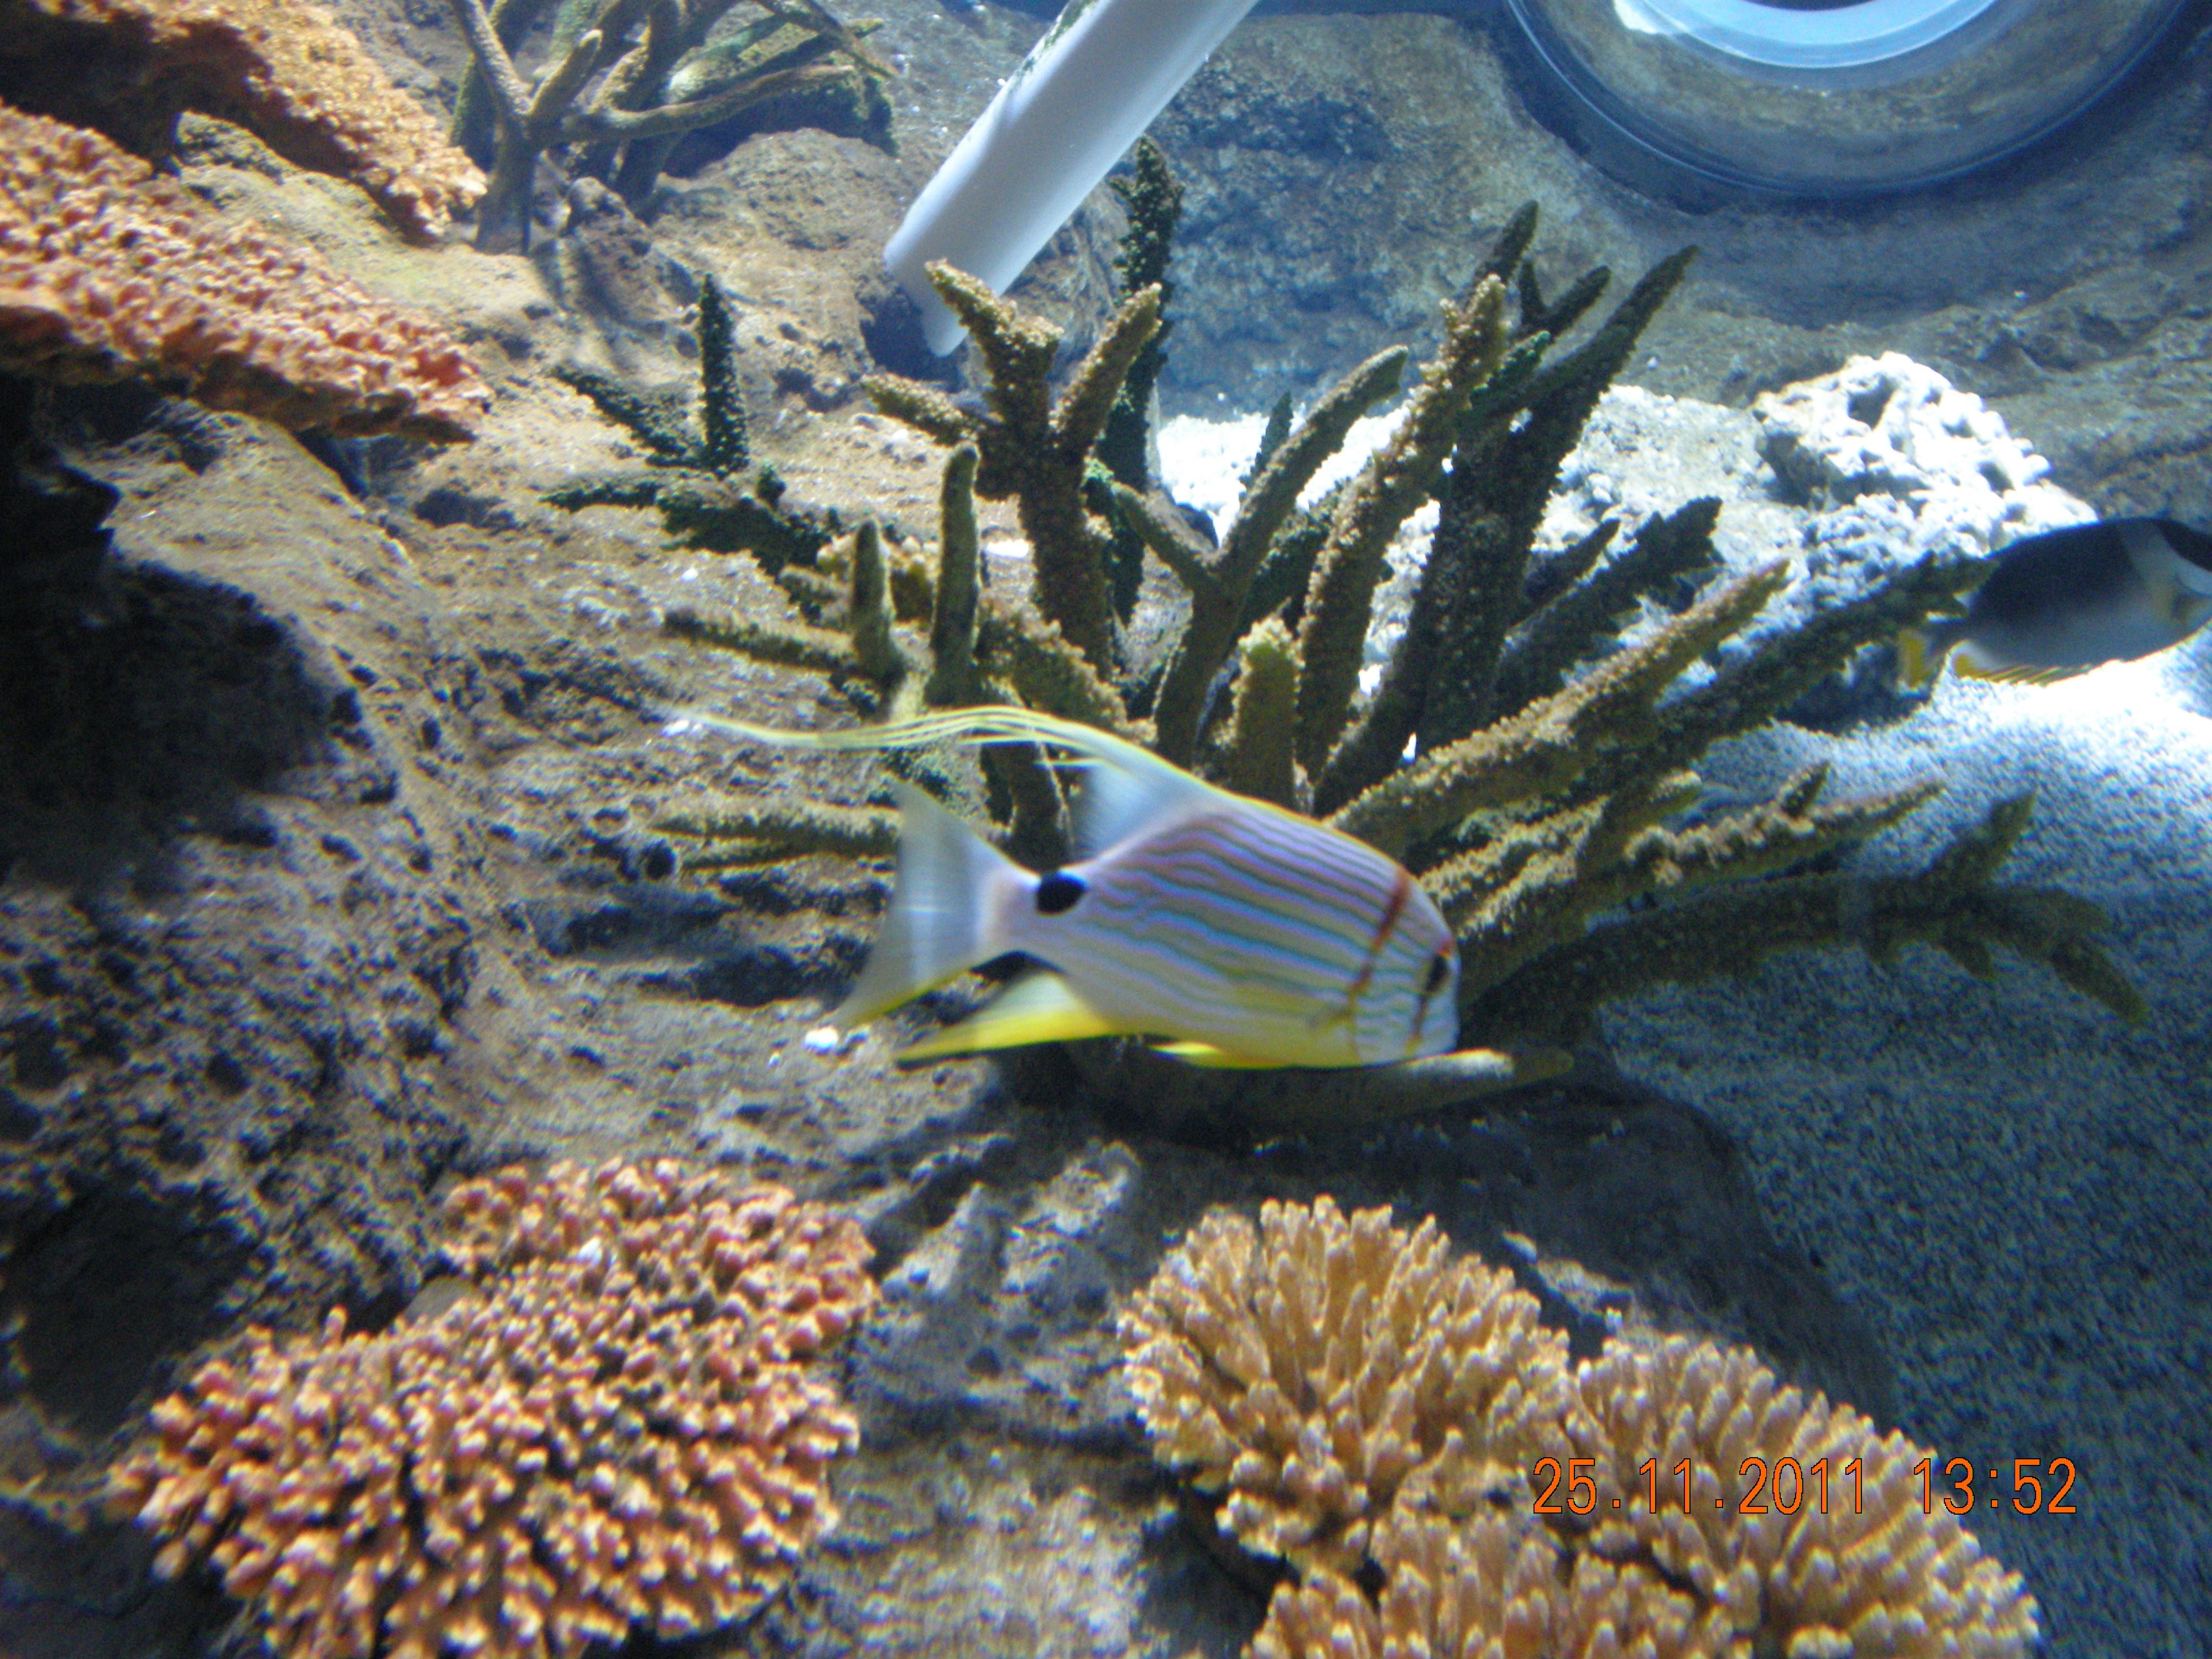 File:Istanbul Aquarium 34.jpg - Wikimedia Commons